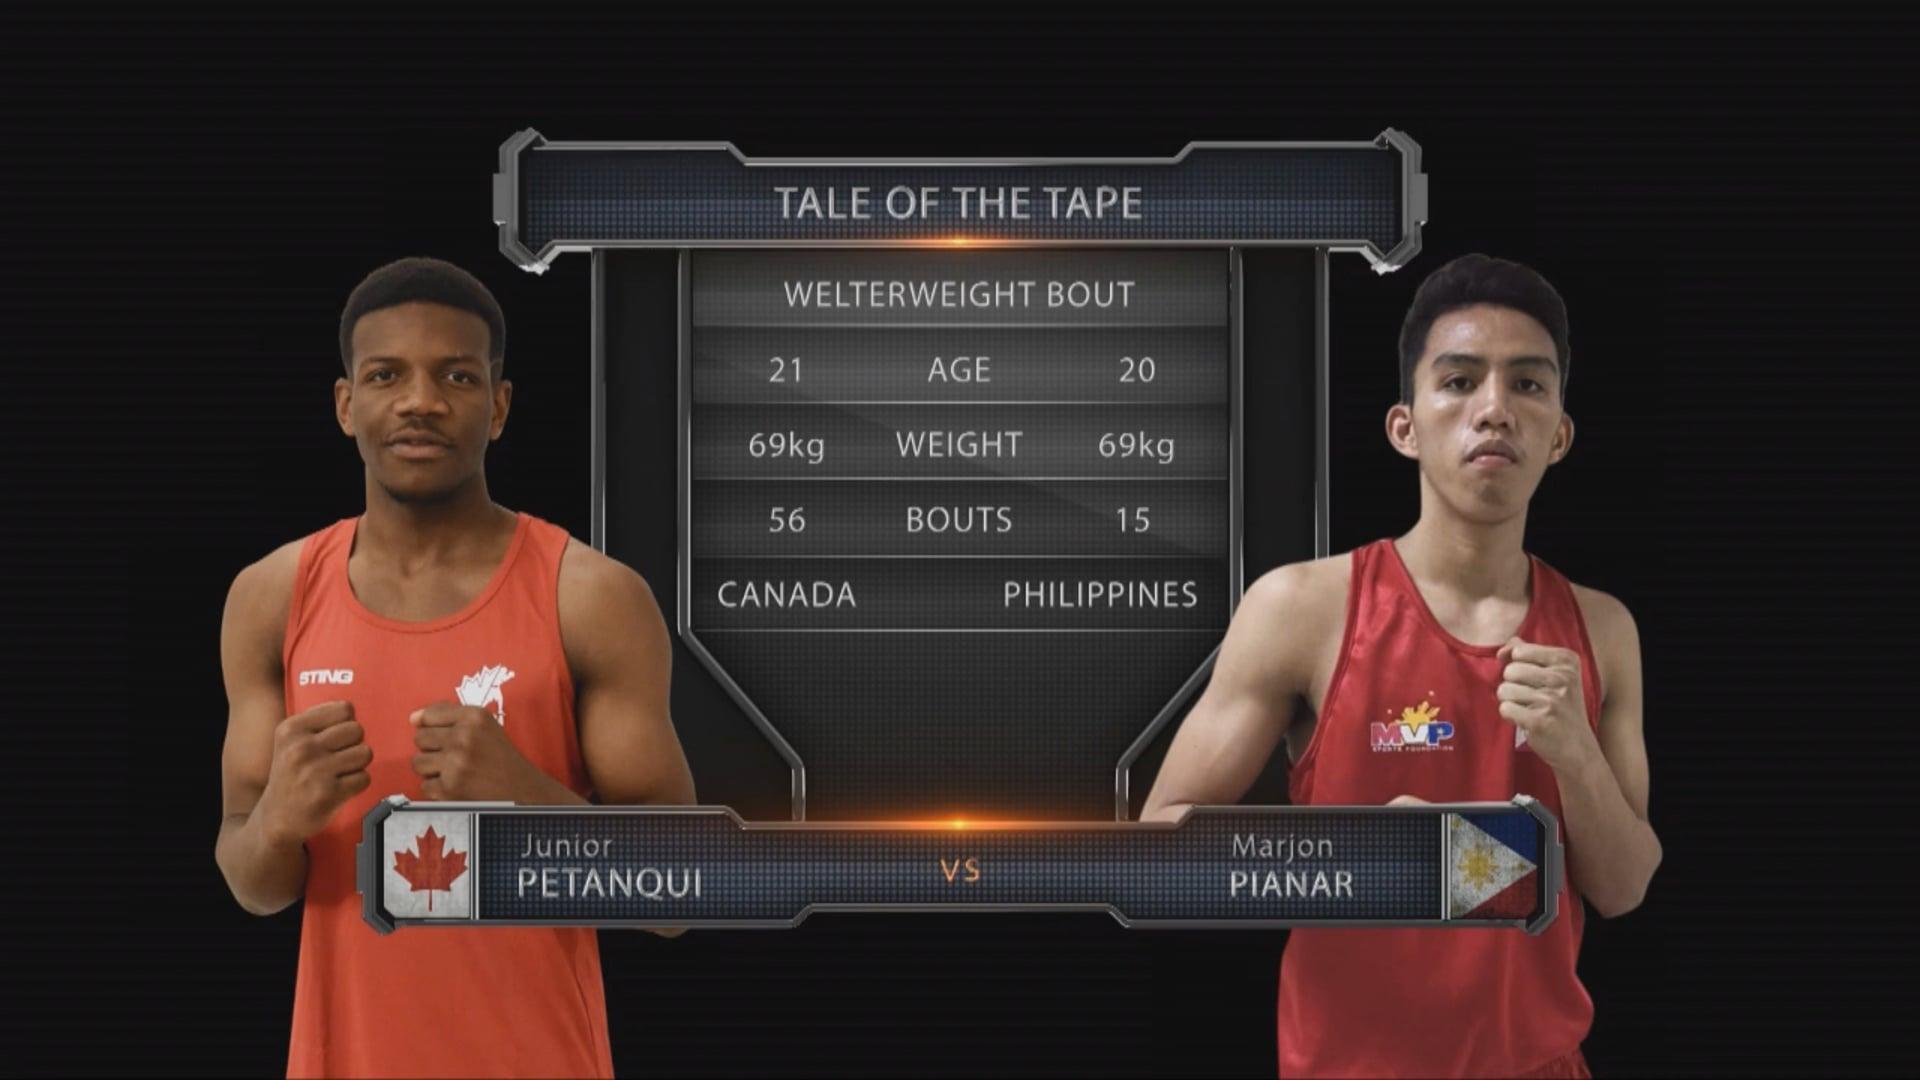 Junior Petanqui (CAN) vs Marjon Pianar (PHL)